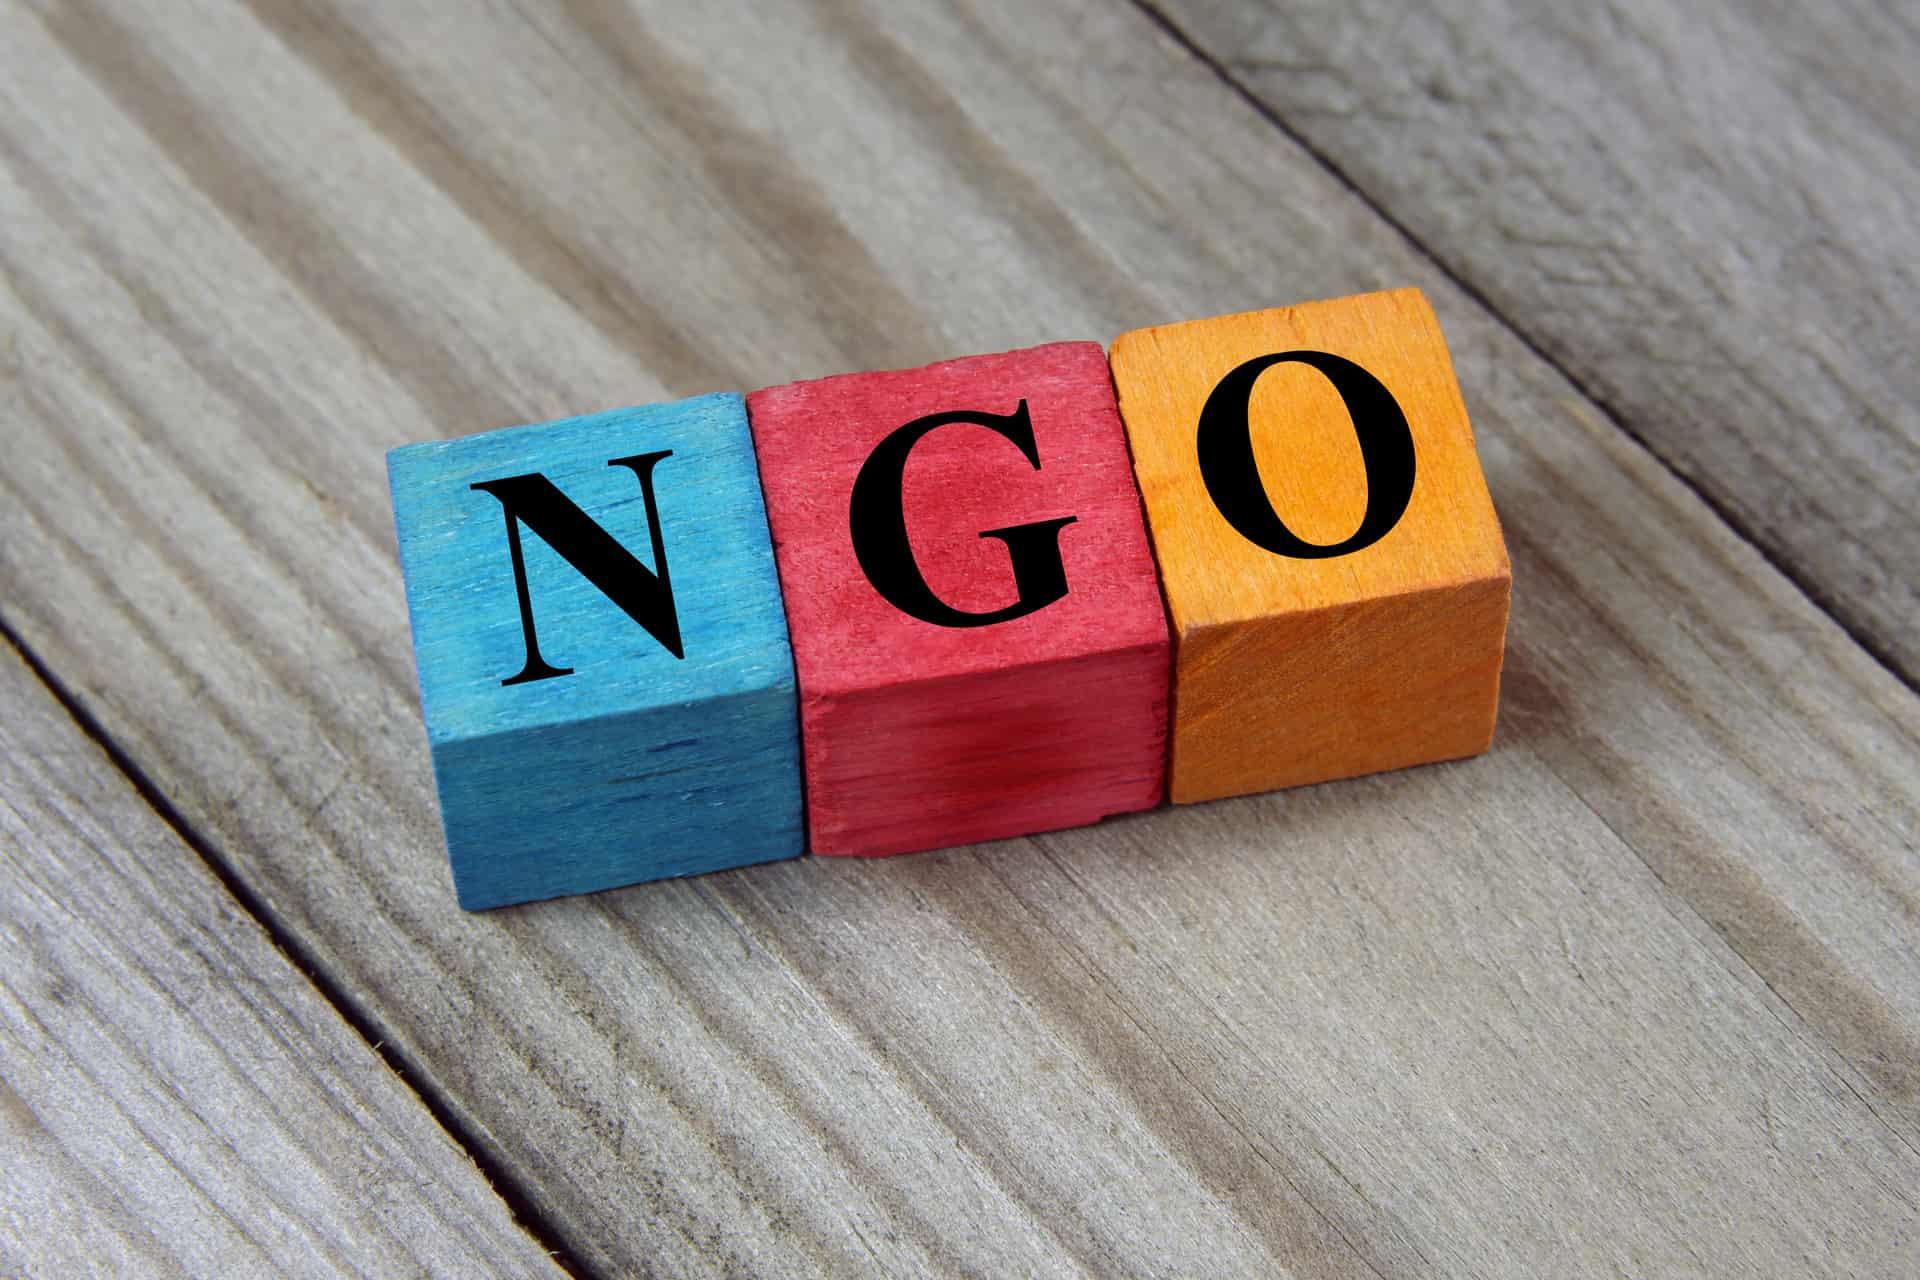 Public Relations dla NGO'sów?